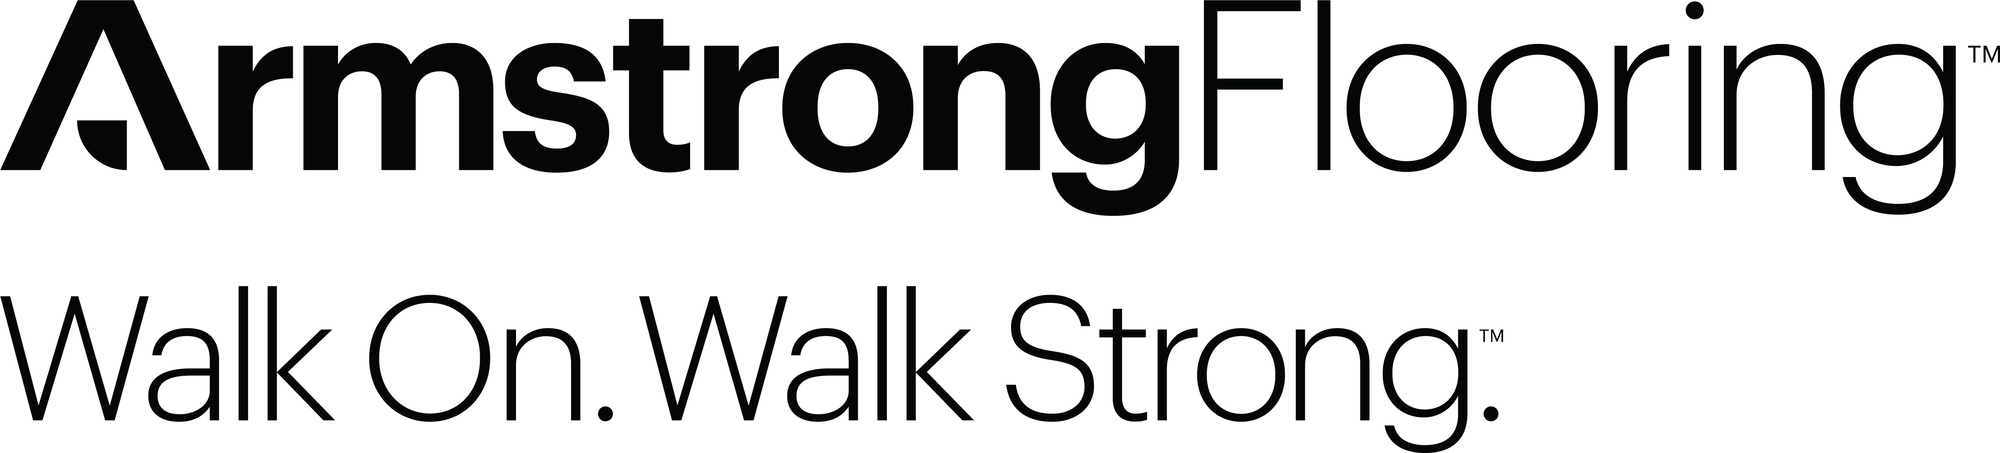 Armstrong Flooring Walk On. Walk Strong.